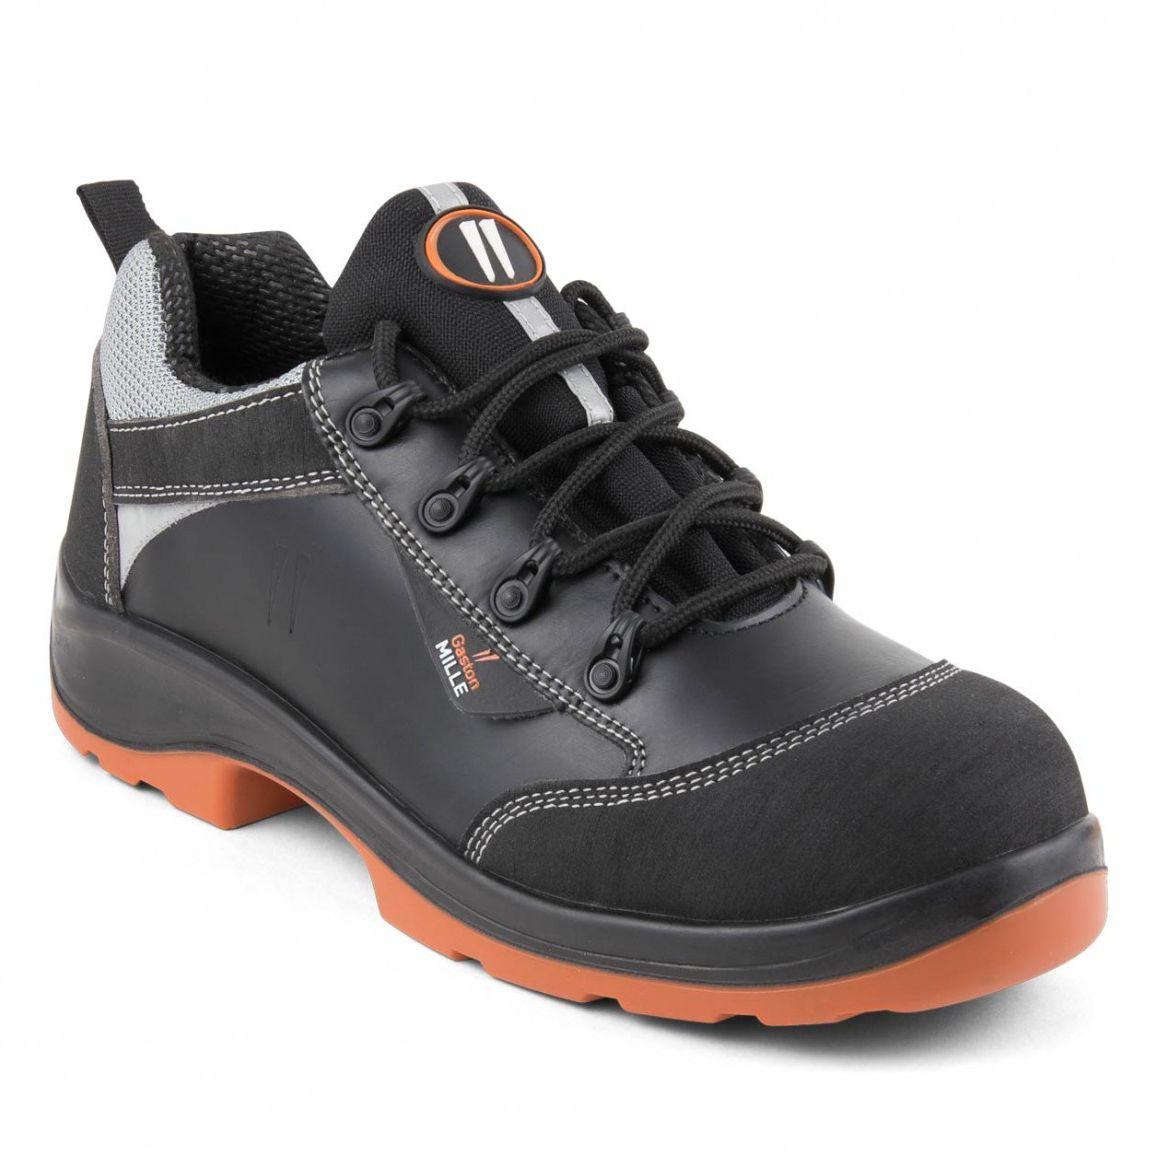 scarpa antinfortunistica storm s3